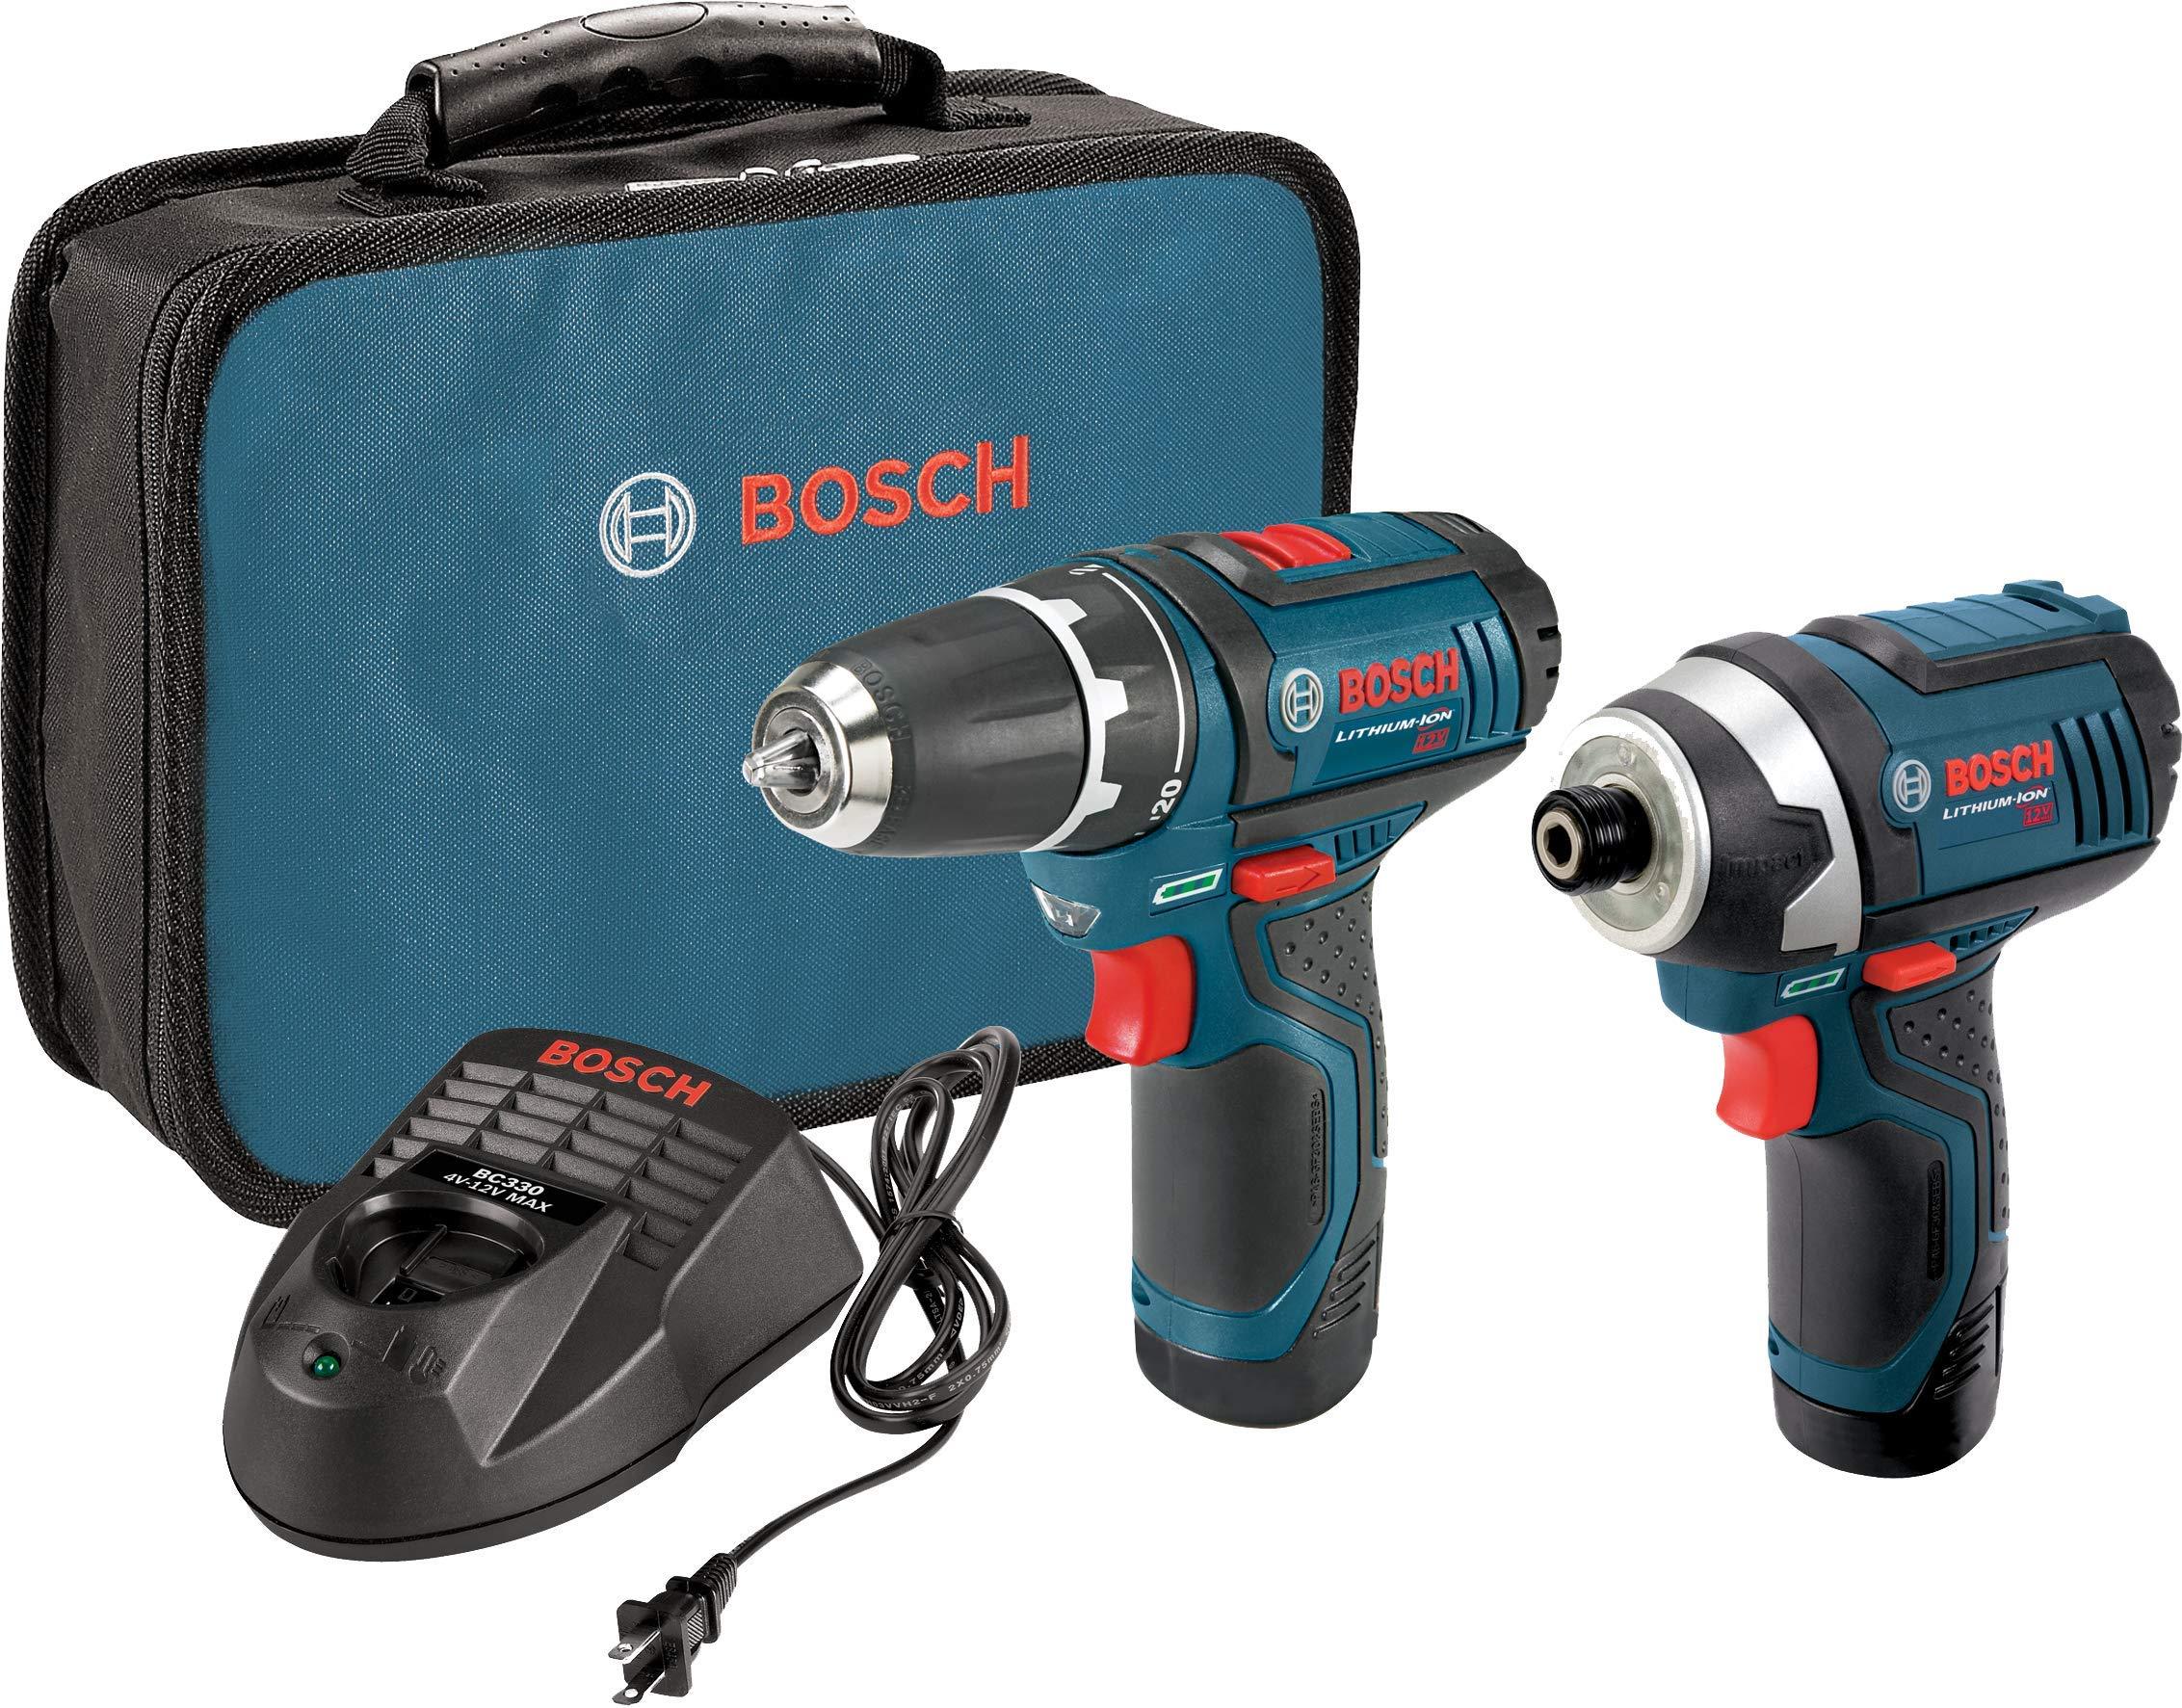 Bosch CLPK22 120 Lithium Ion Batteries Carrying